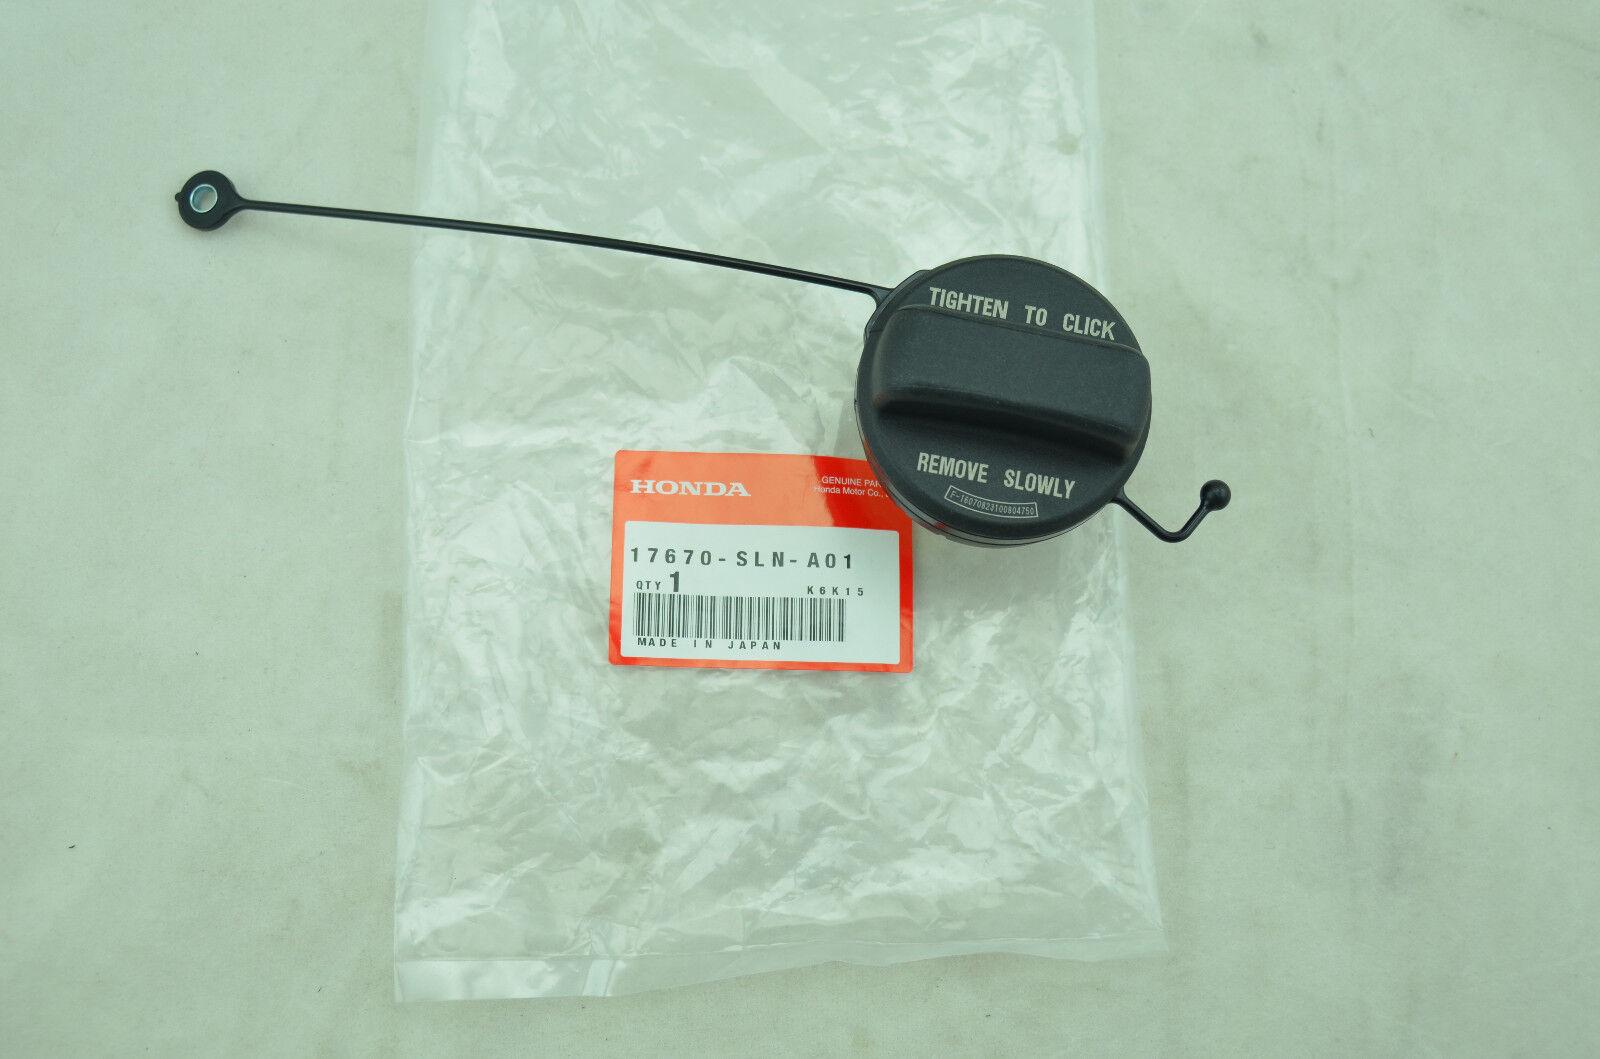 Genuine Honda 17670-SLN-A01 Fuel Filler Cap